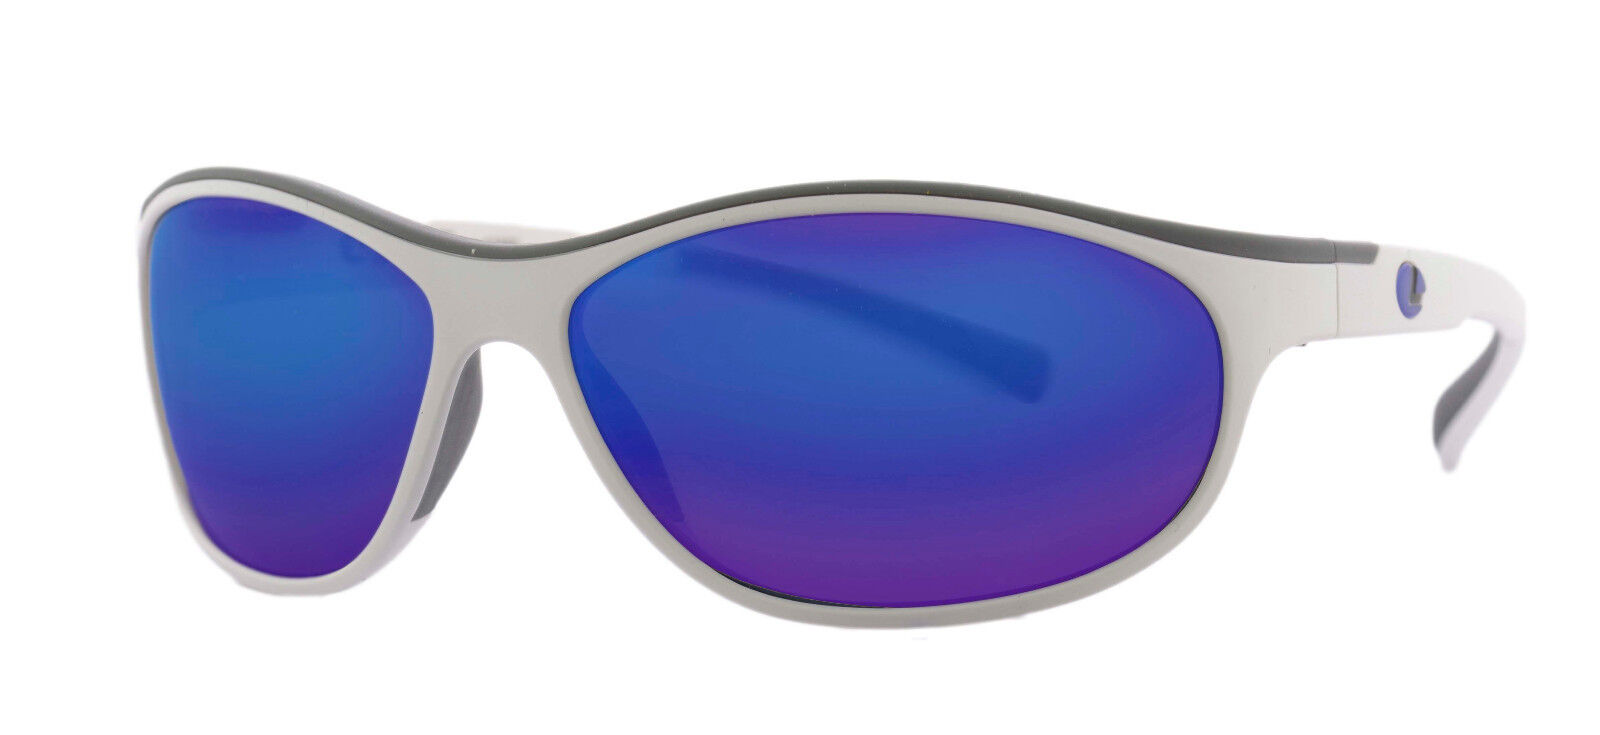 LENZ OPTICS Discover Coosa White/GunBlueMirrorLens Polarisationsbrille 53880